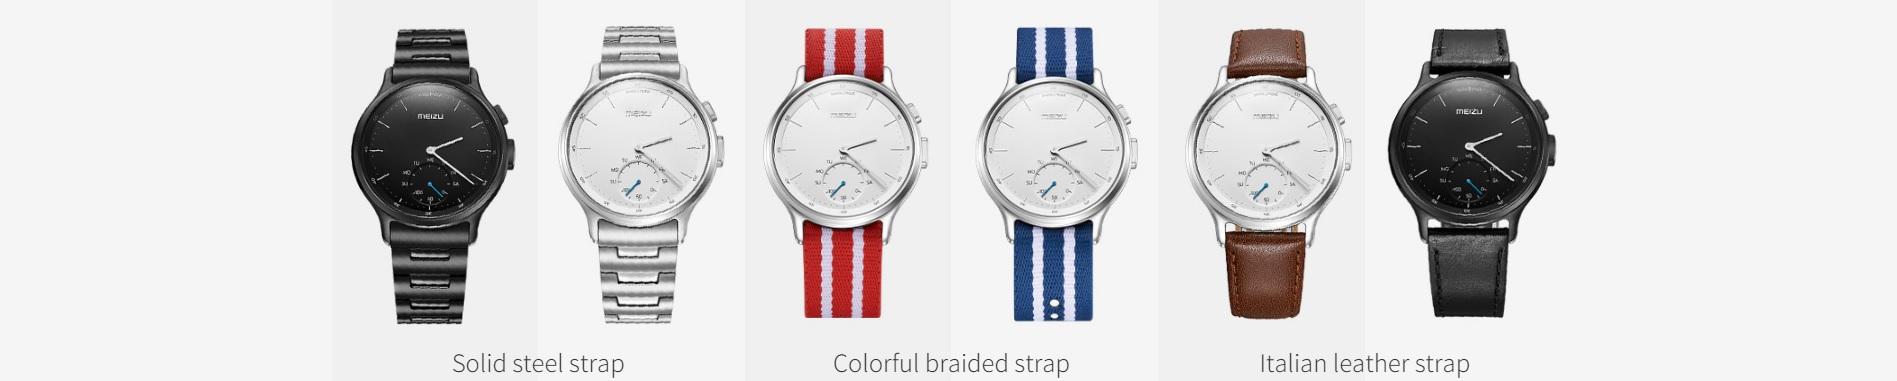 smartwatch Meizu Smart Watch MIX